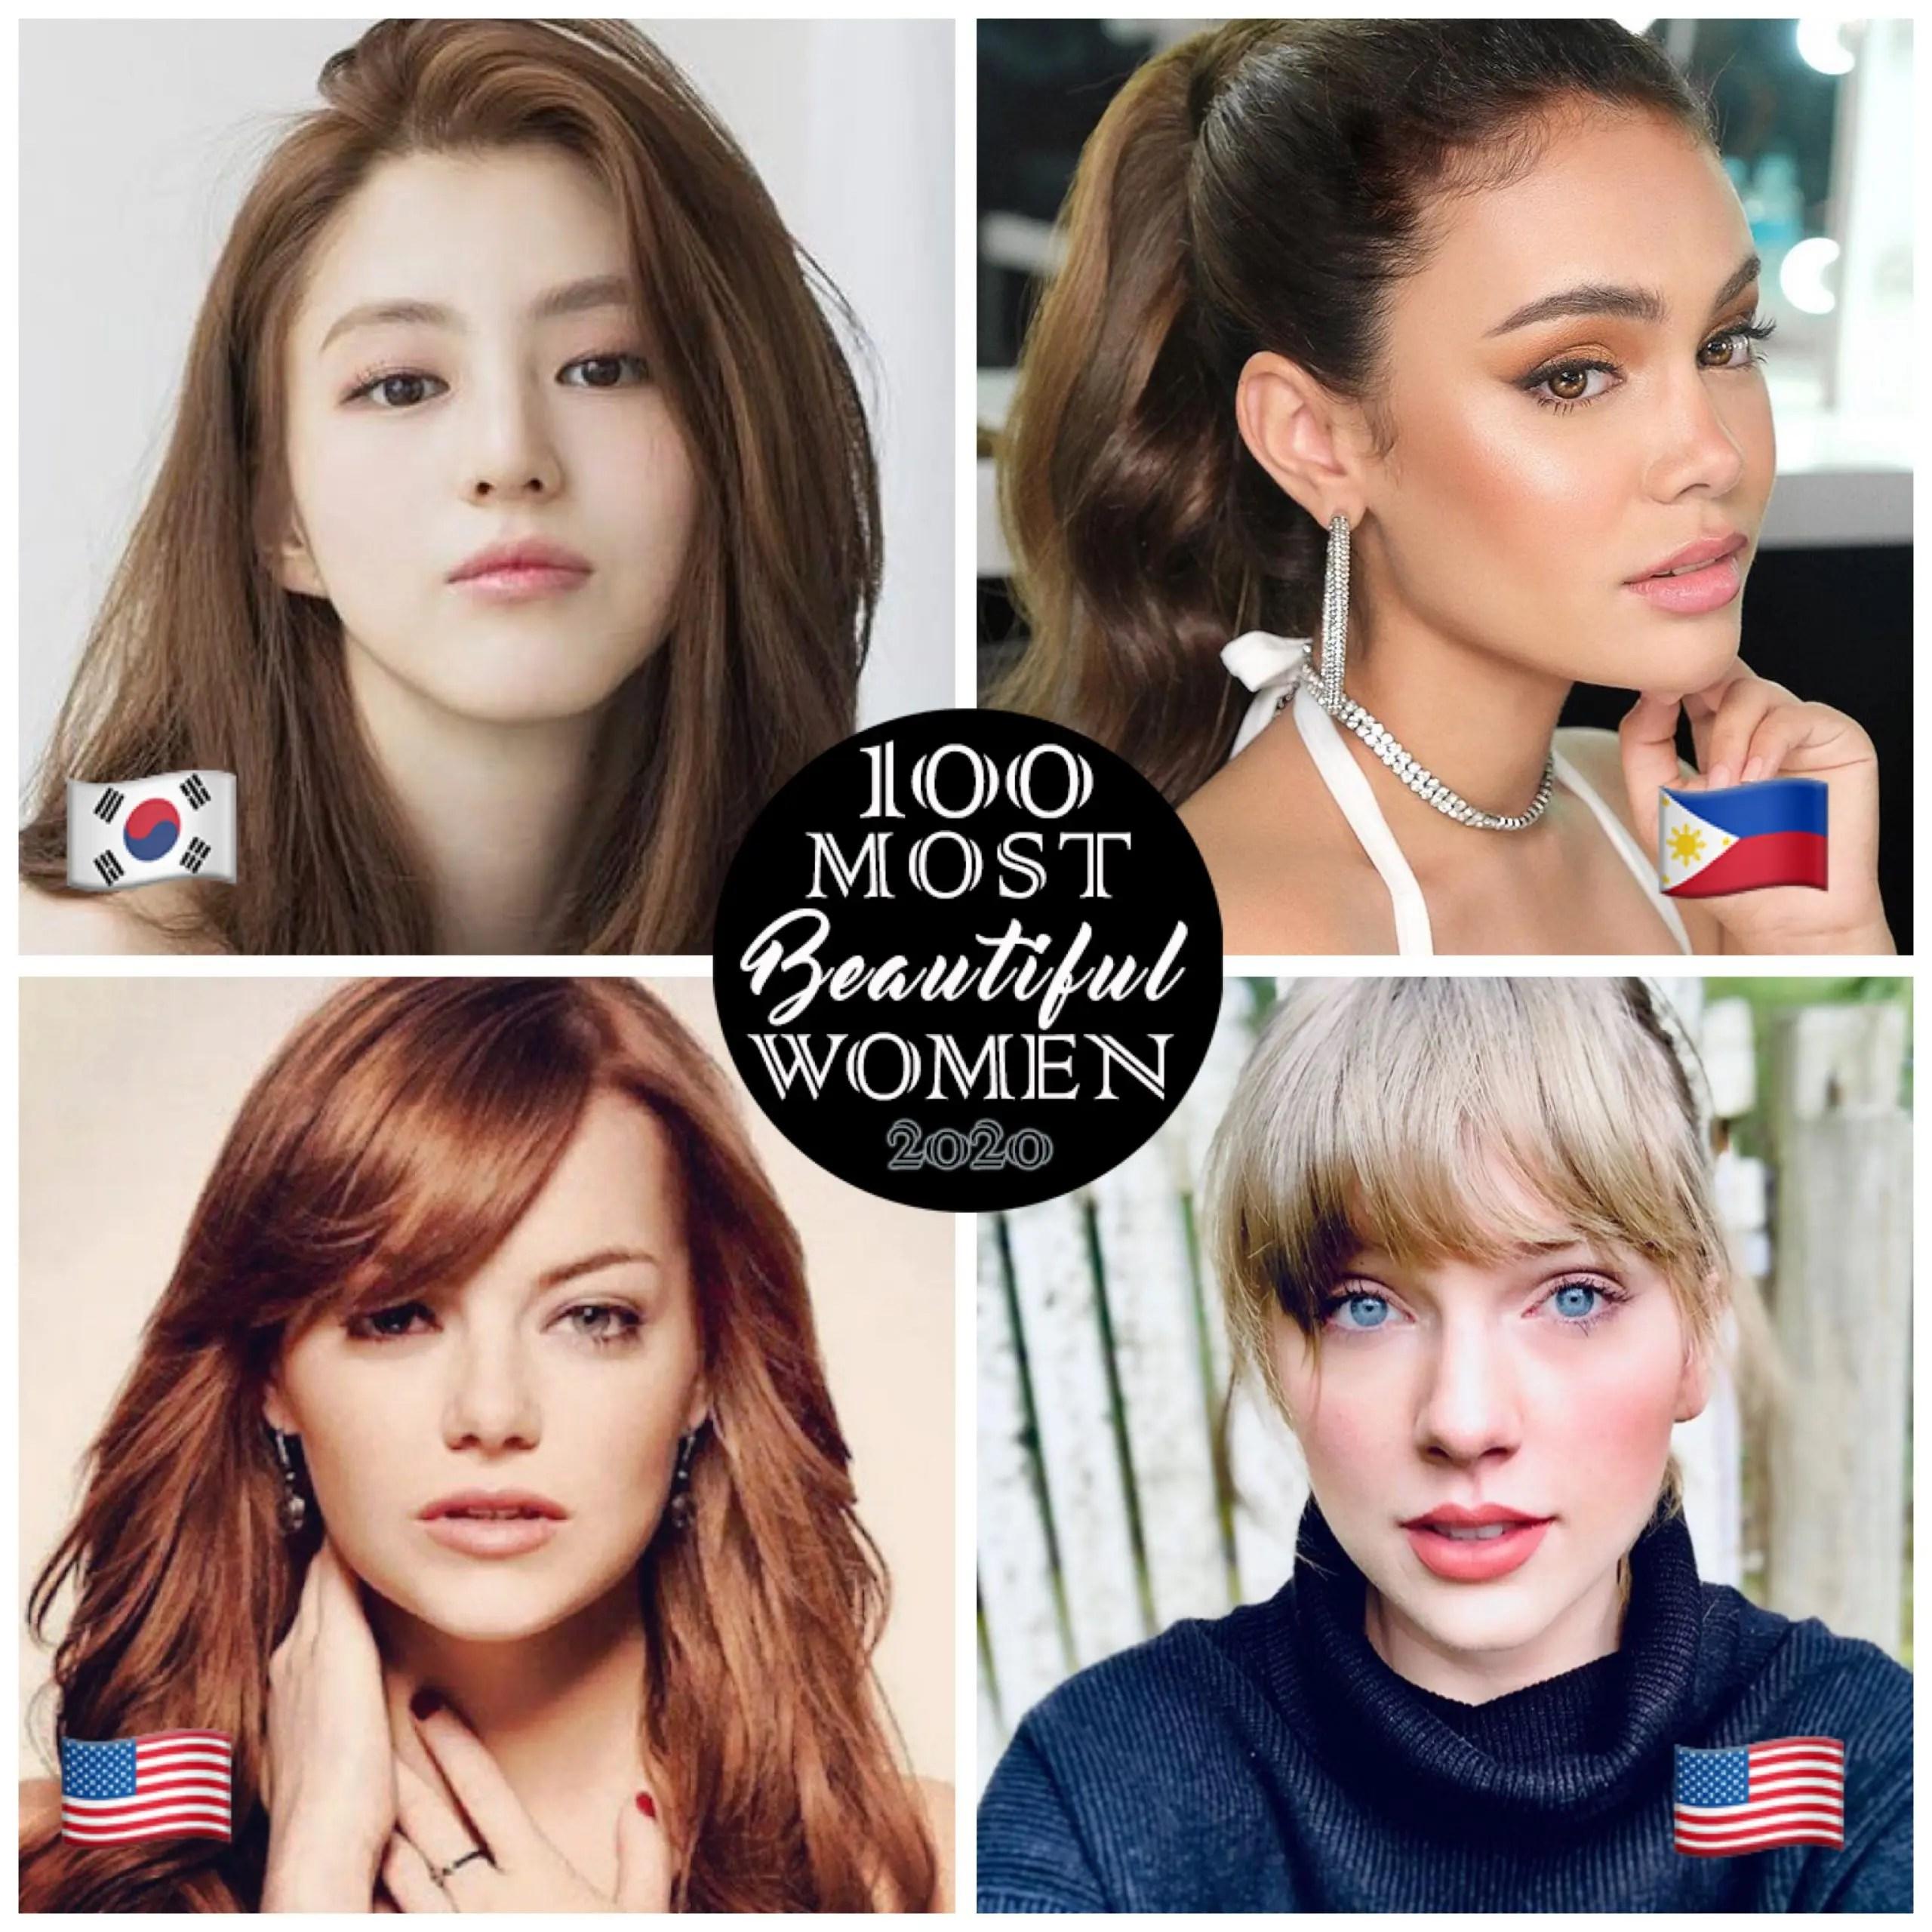 So many beautiful women